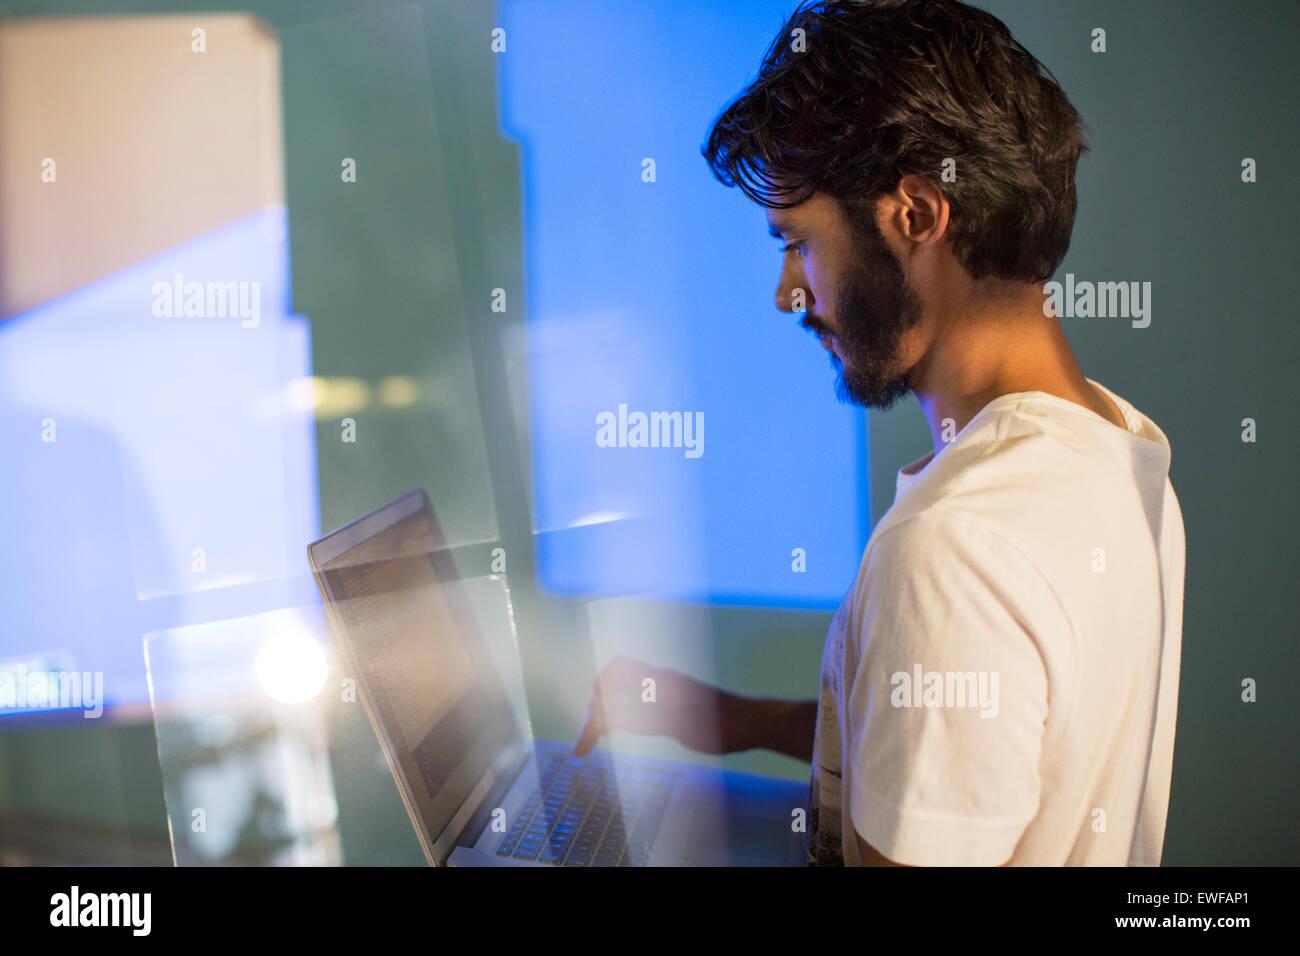 Empresario casual con portátil preparando presentación audiovisual Imagen De Stock